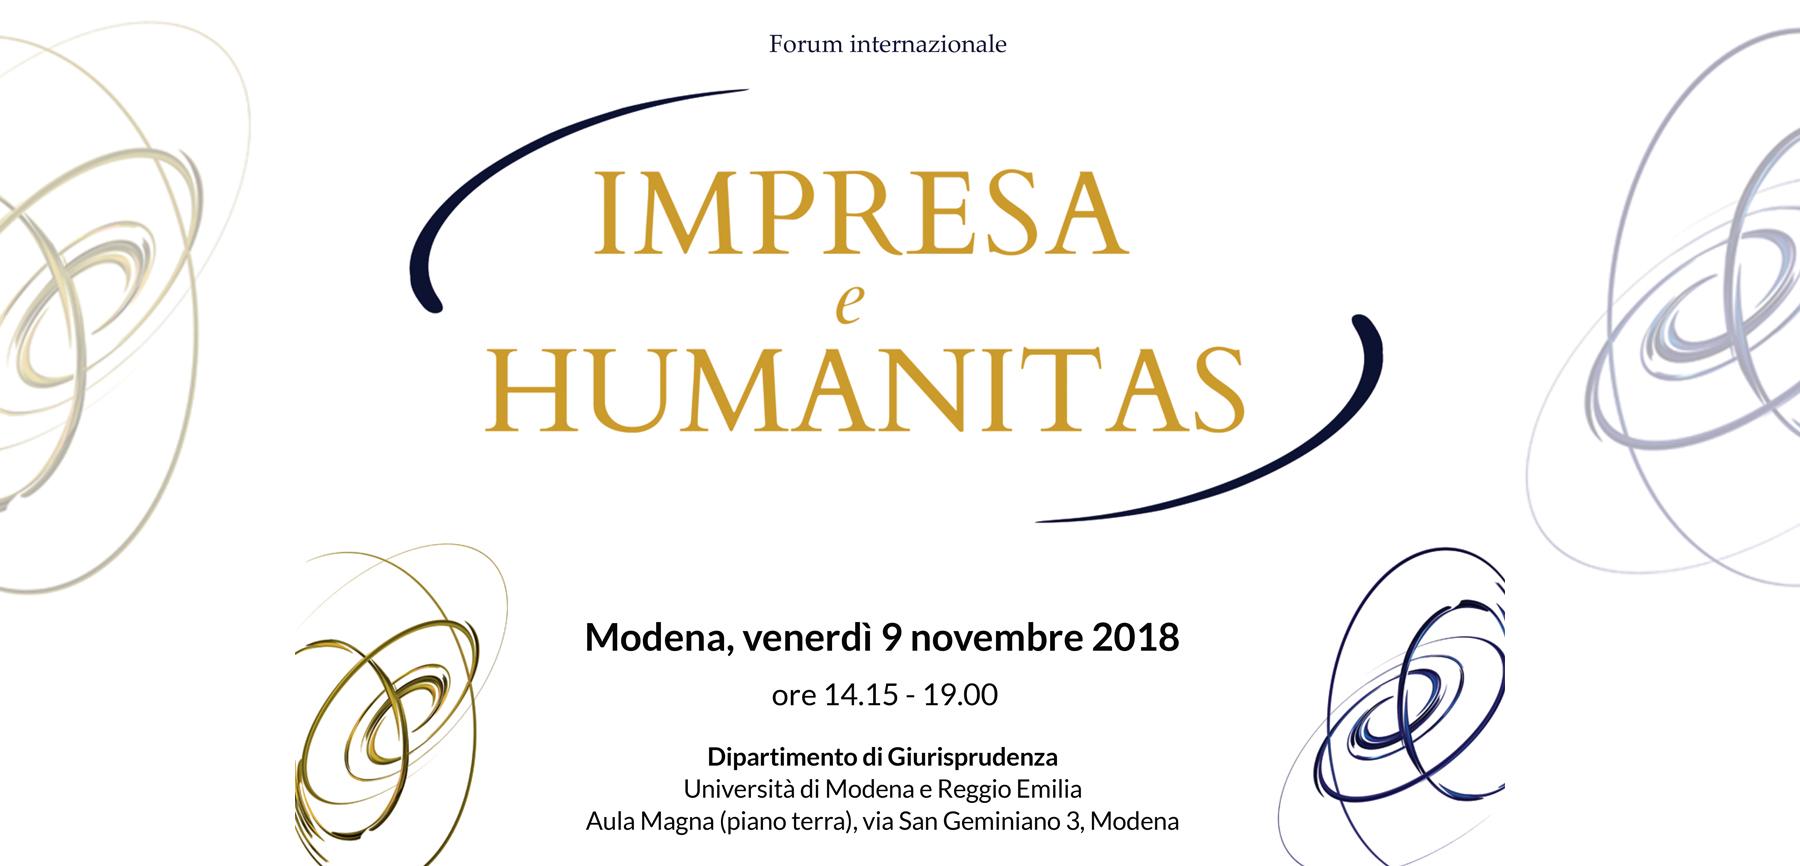 Forum internazionale Impresa e humanitas